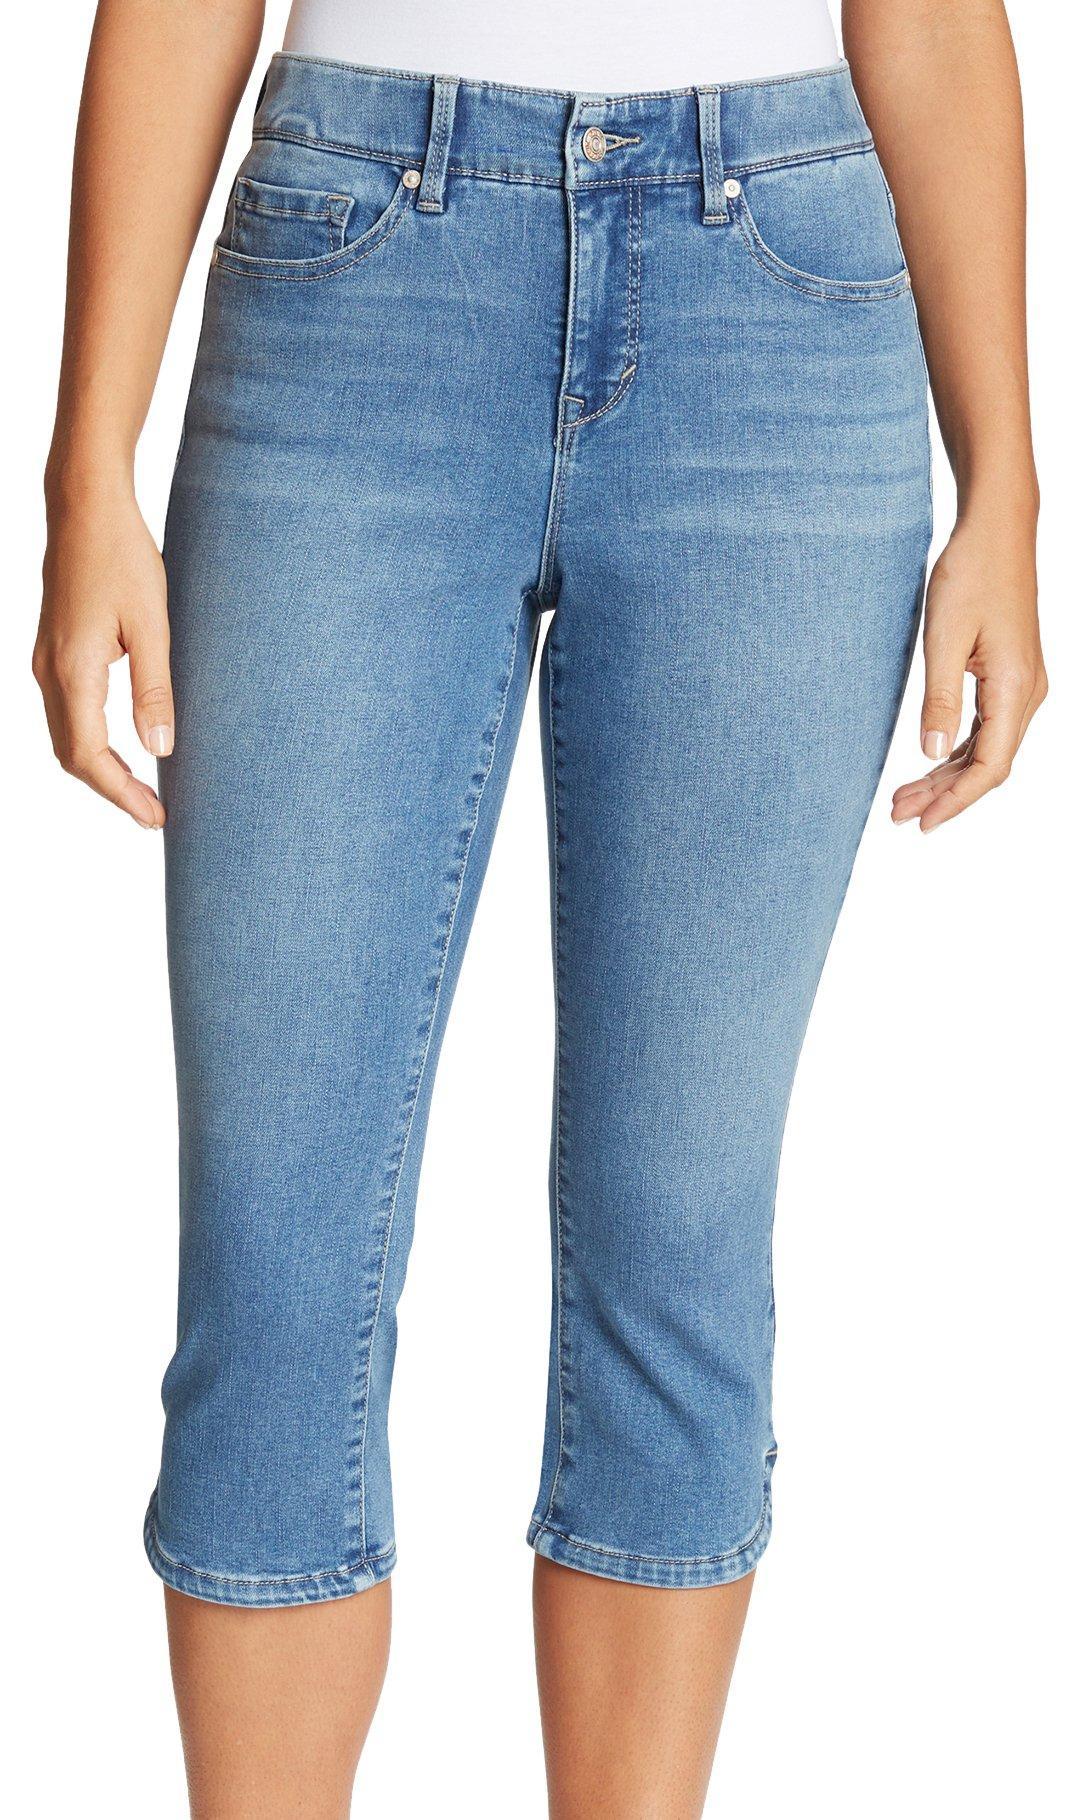 Gloria Vanderbilt Womens Comfort Curvy Skinny Jean Capri Length Jeans